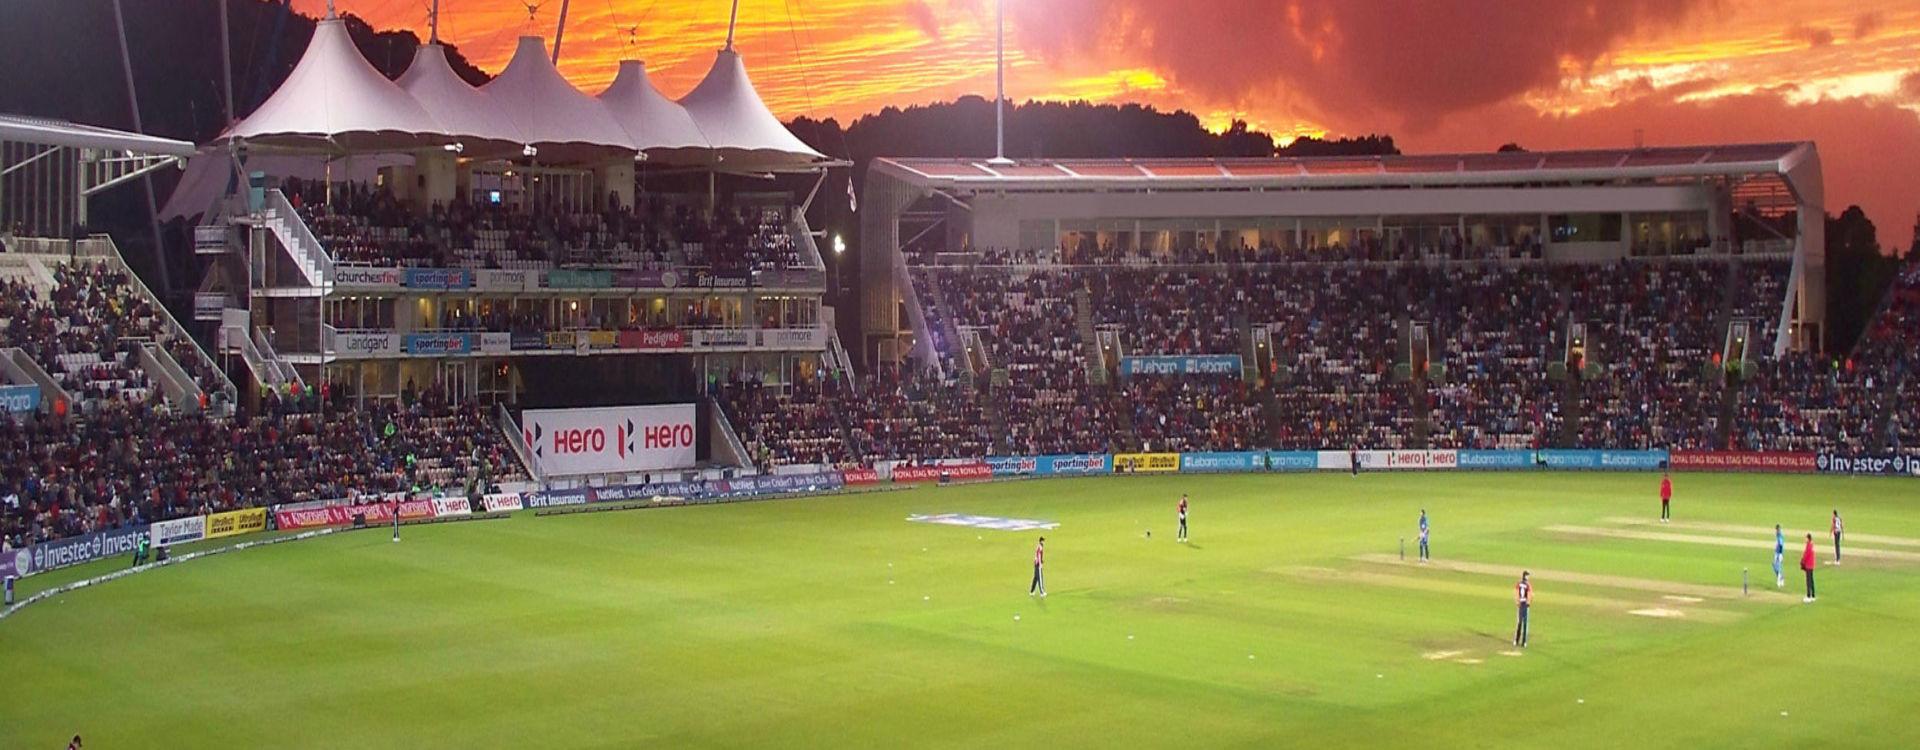 Ageas Bowl Cricket Hospitality Gala Hospitality